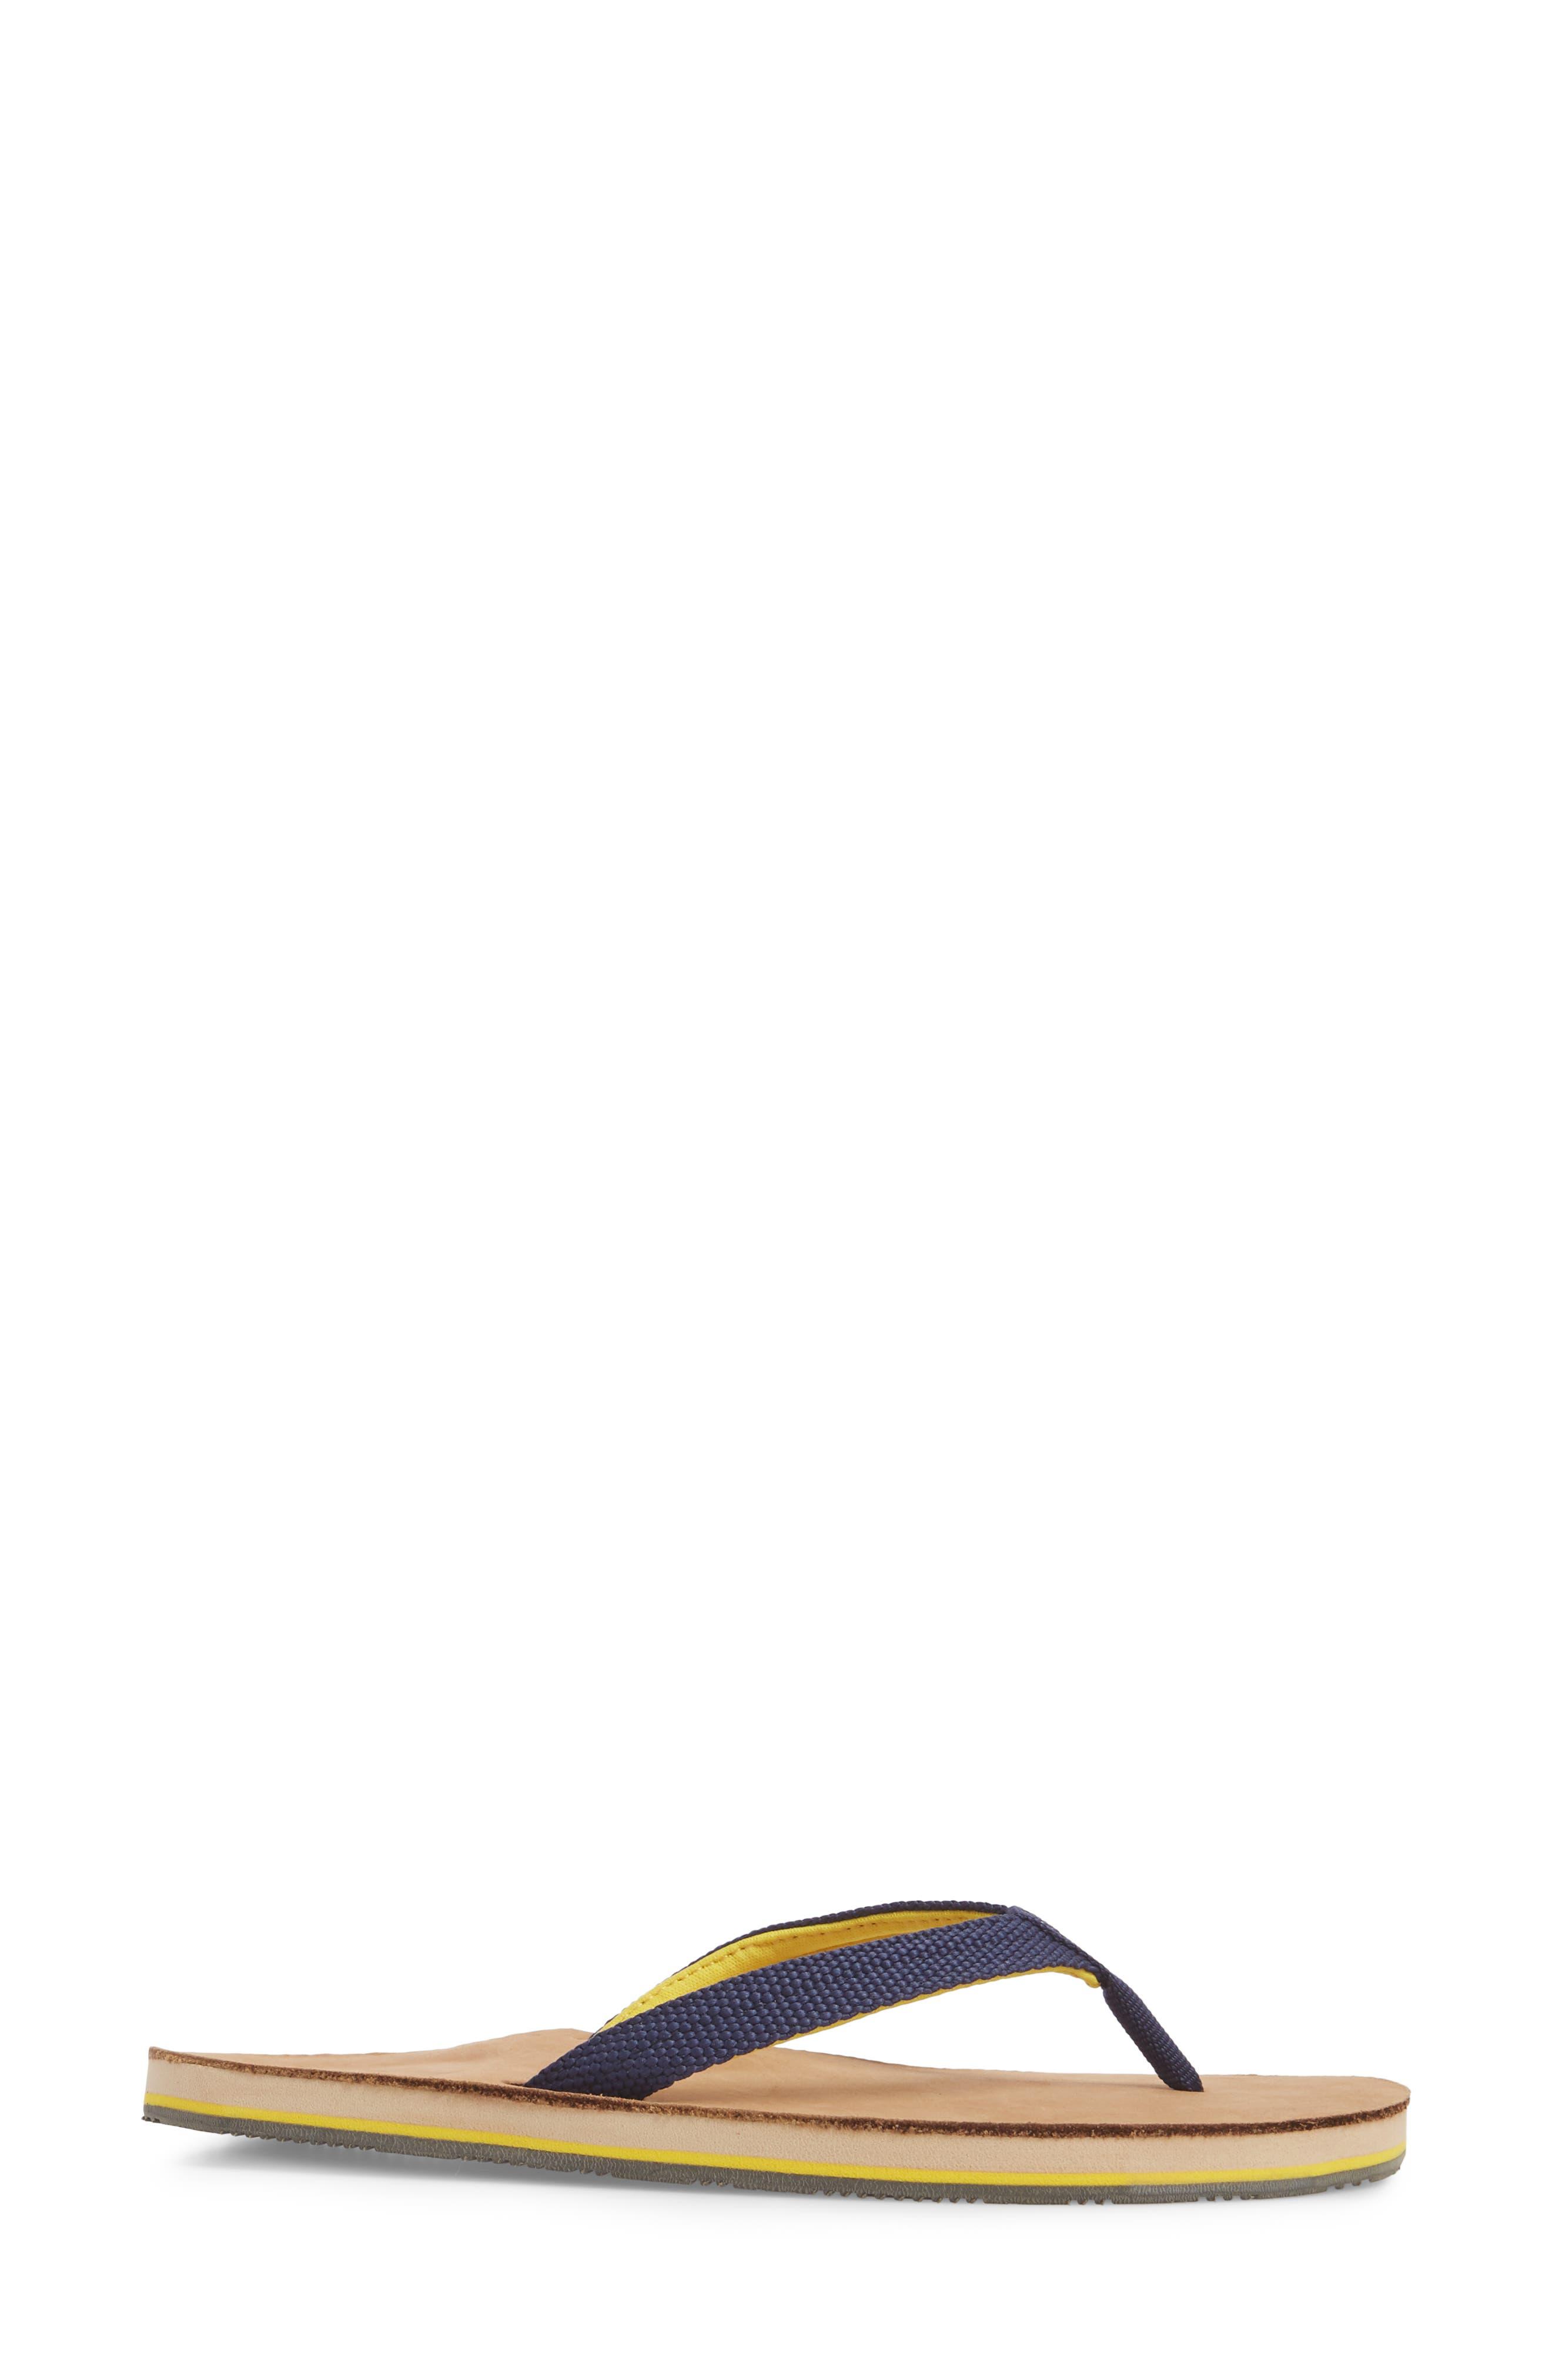 Scouts Flip Flop,                             Alternate thumbnail 3, color,                             Navy Yellow